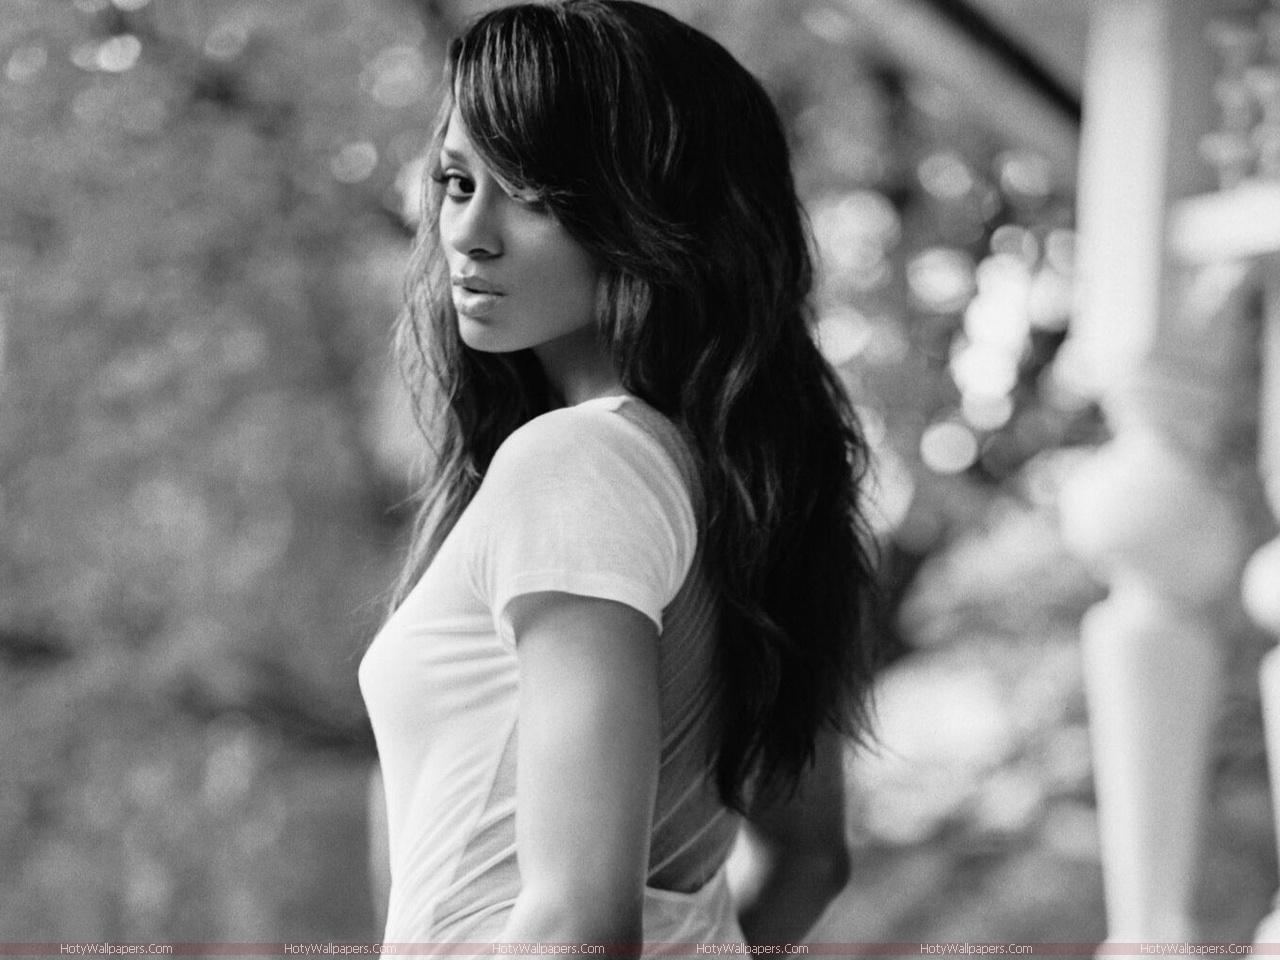 Ciara hollywood singer wallpapers fun hungama - Ciara wallpaper ...